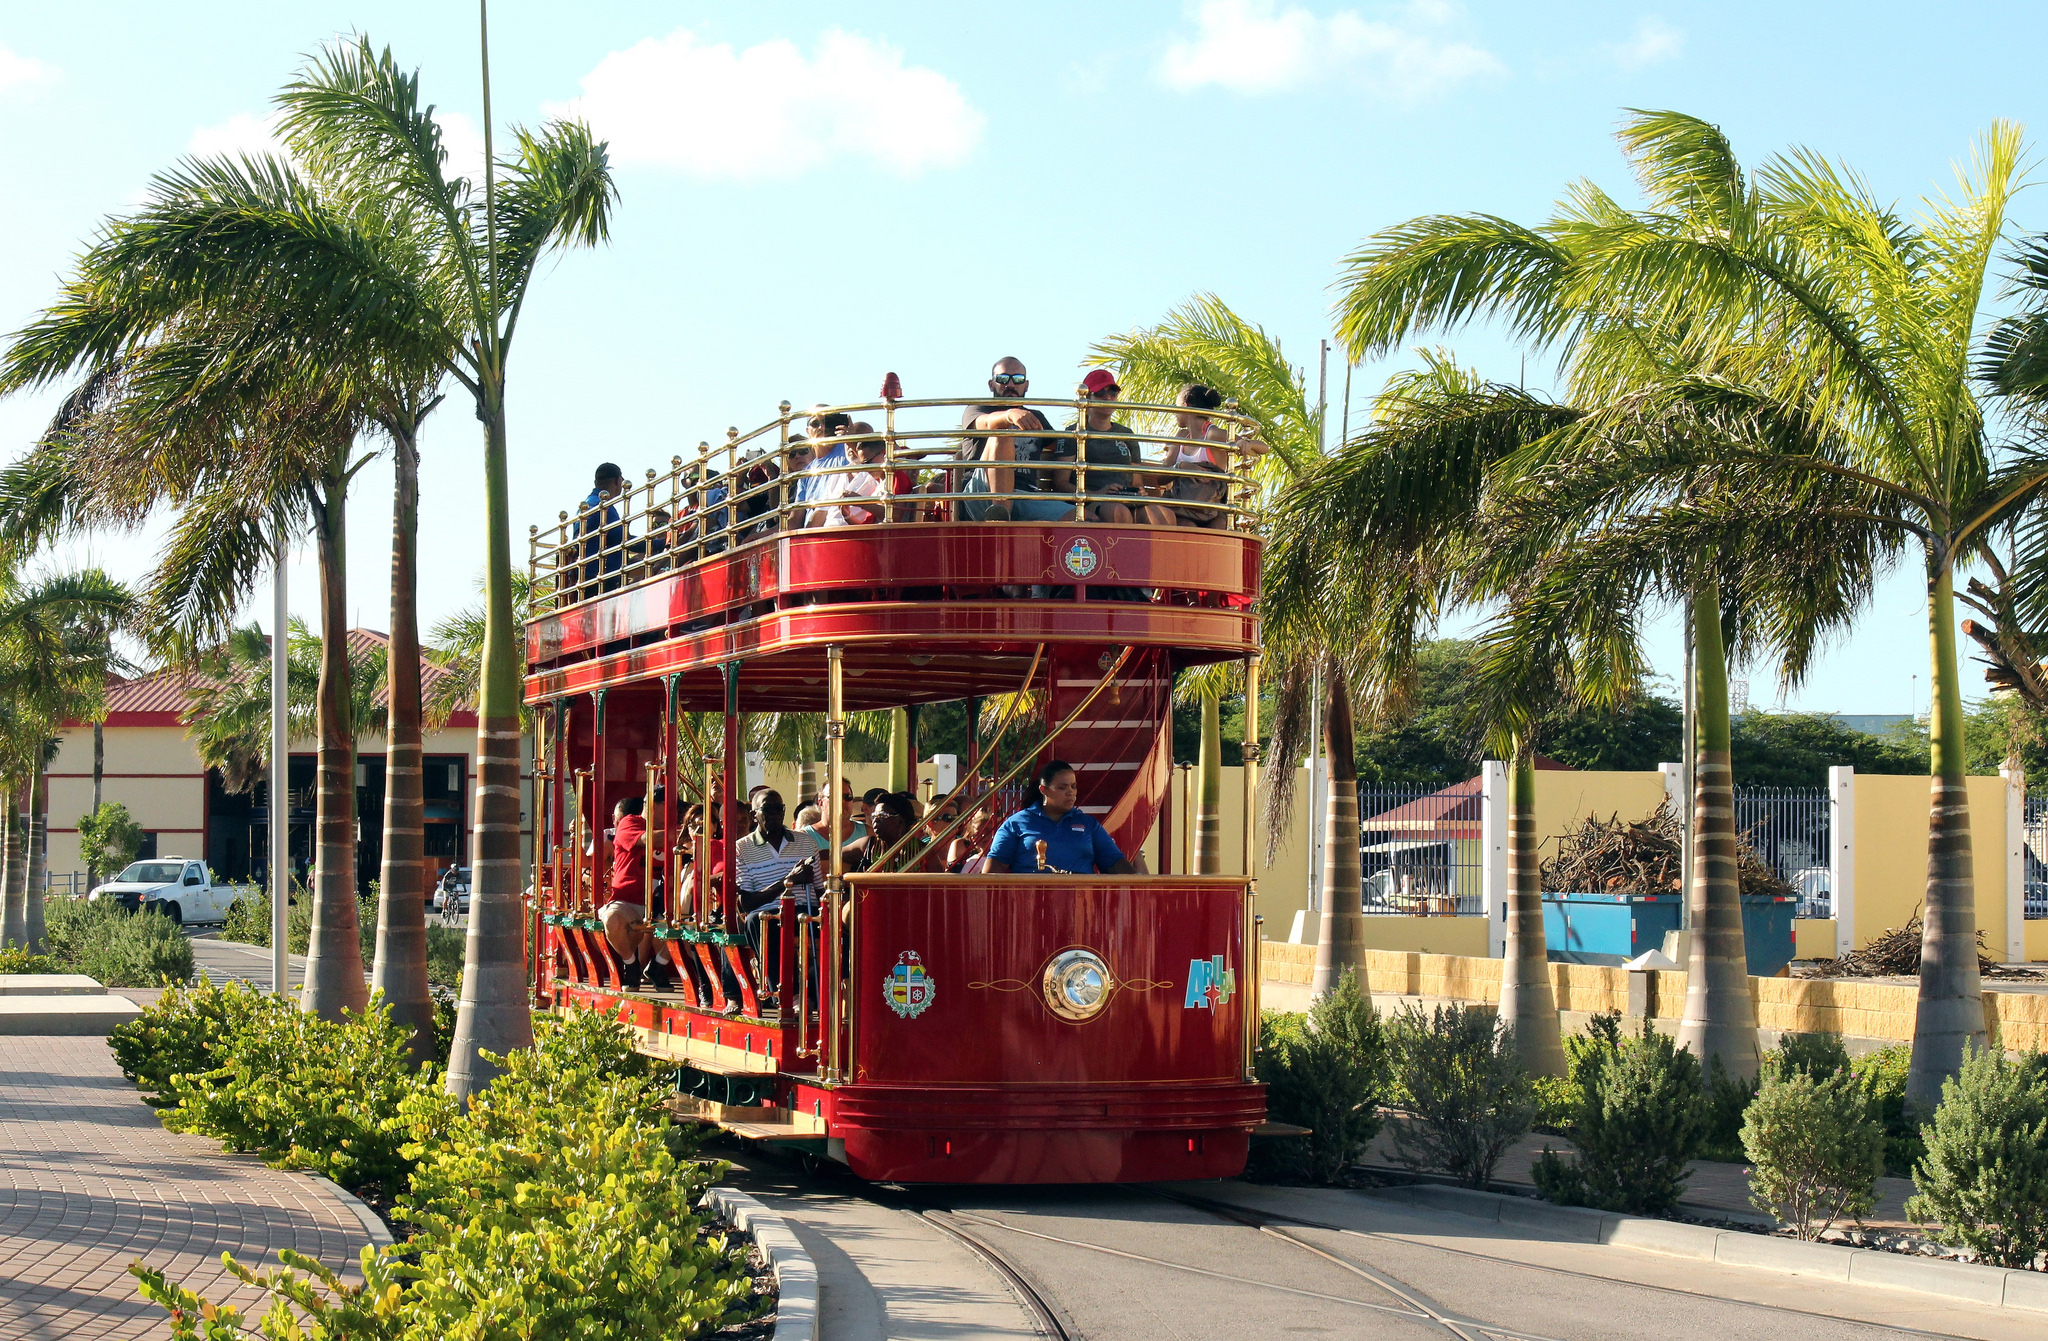 the free tourist trolley in Oranjestad